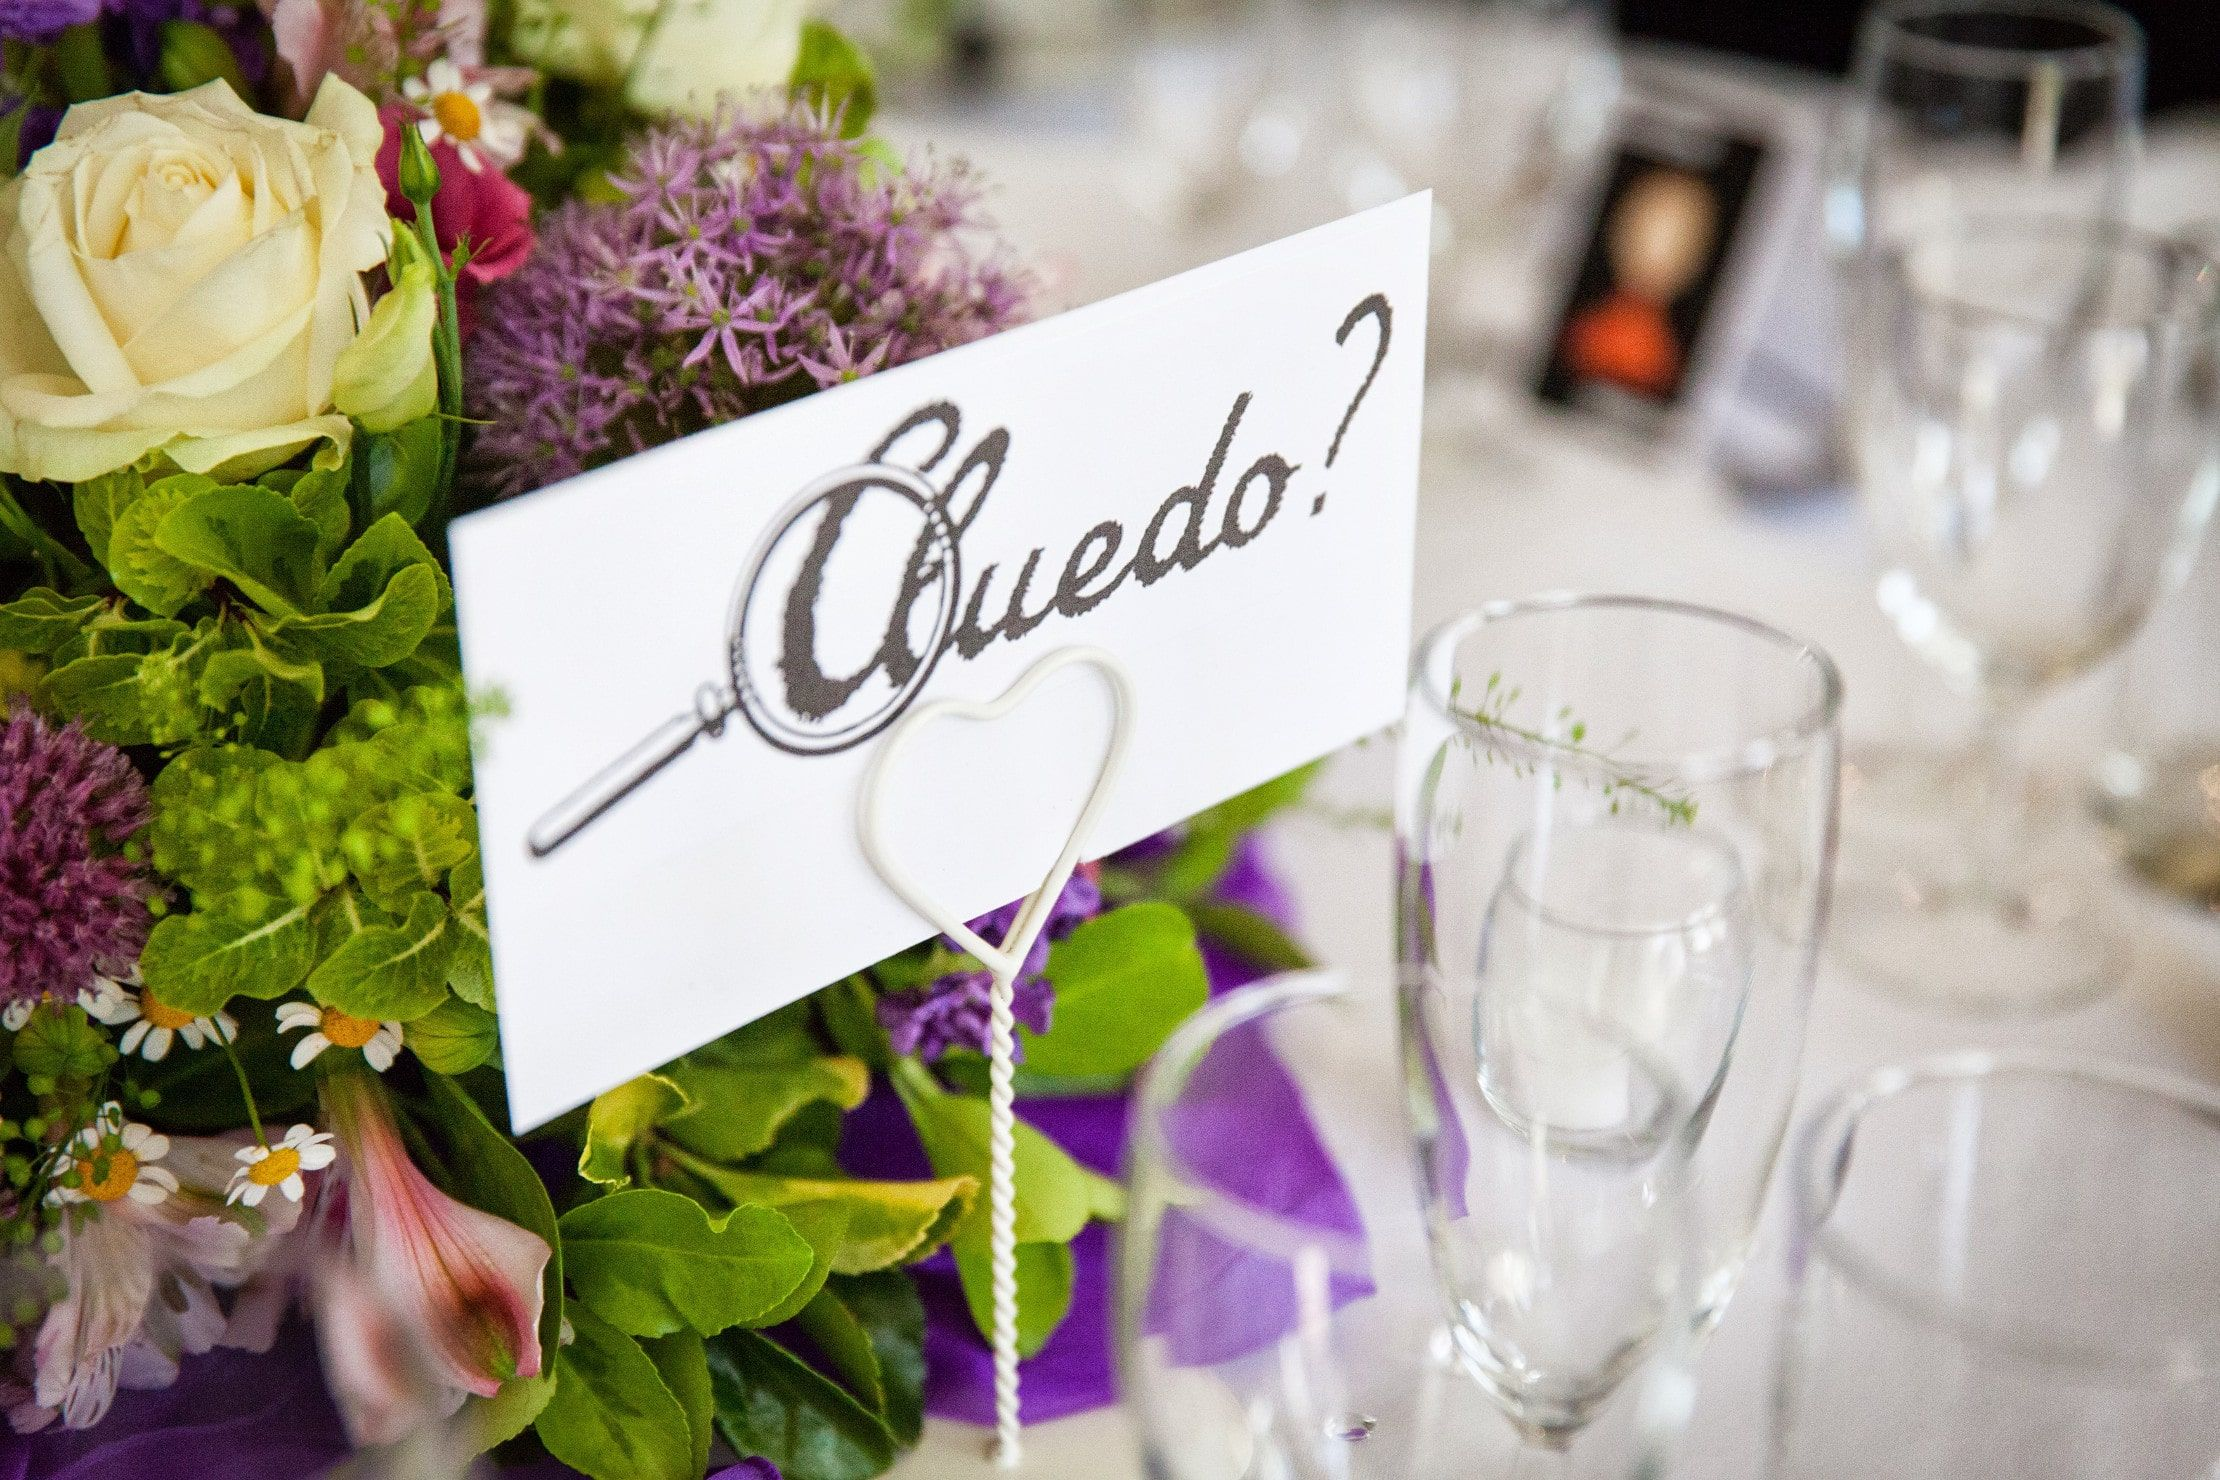 Dorable Themed Weddings In Vegas Image - Wedding Idea 2018 ...